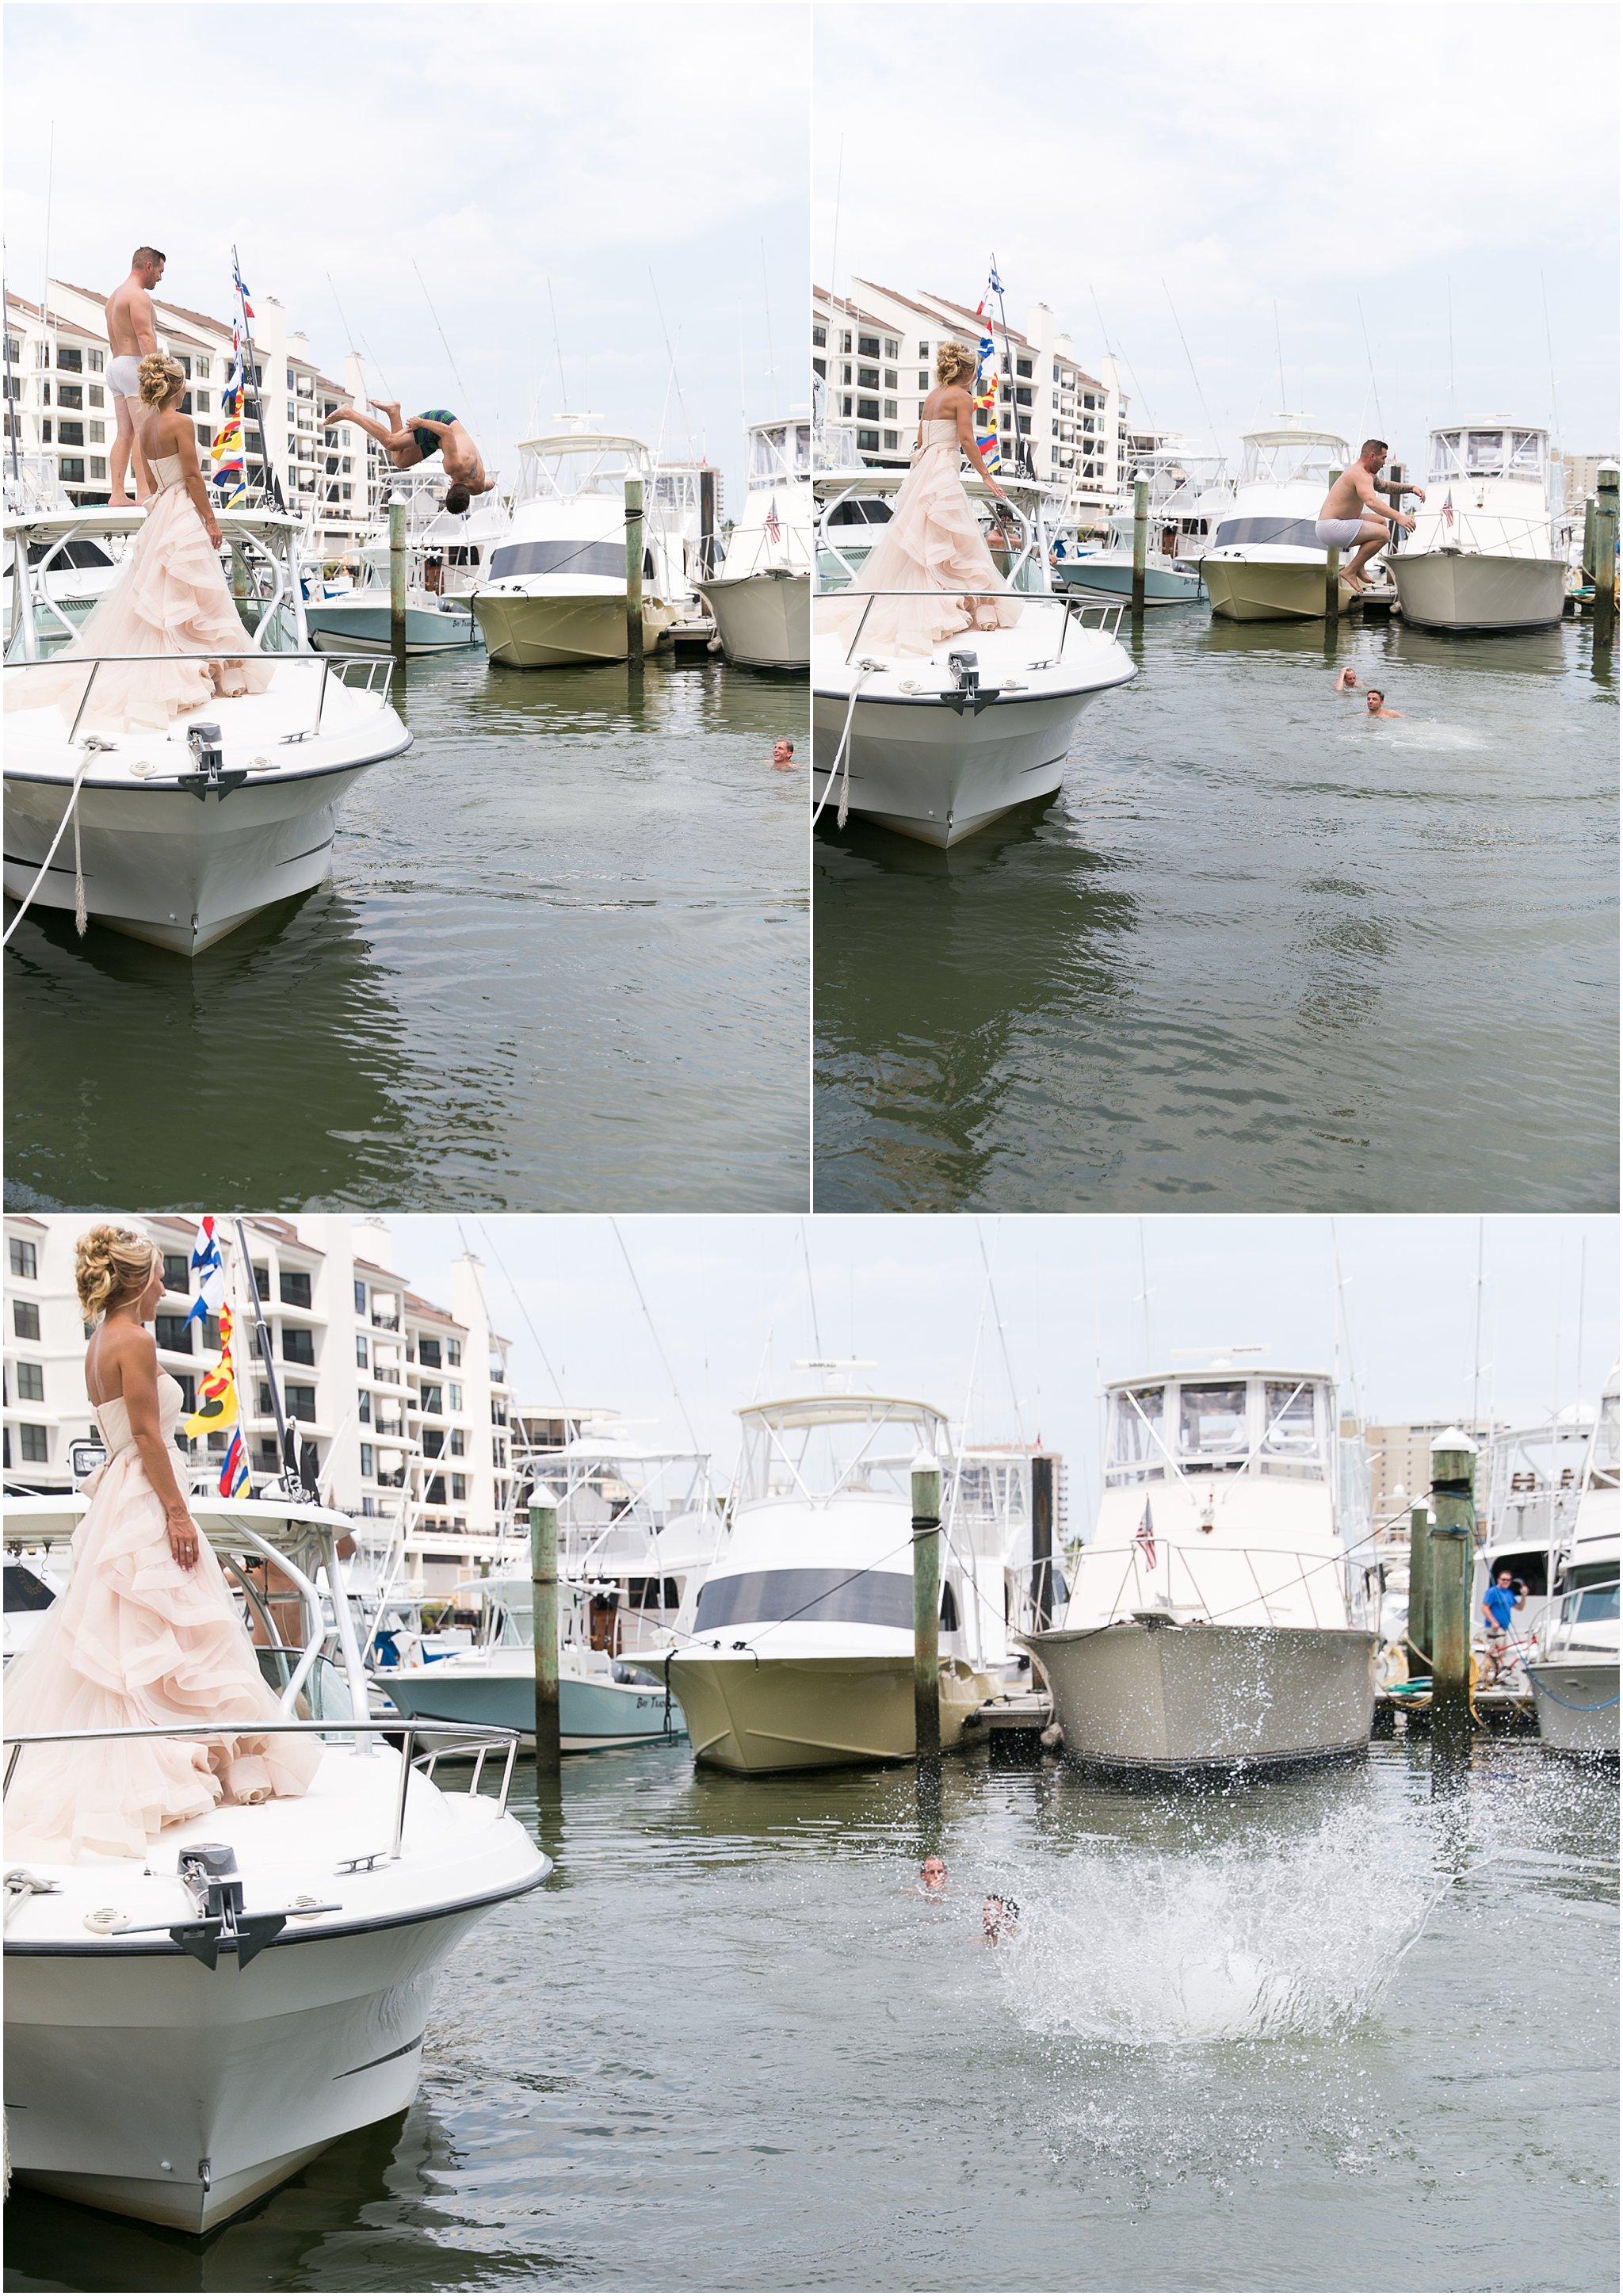 jessica_ryan_photography_wedding_hampton_roads_virginia_virginia_beach_weddings_0640